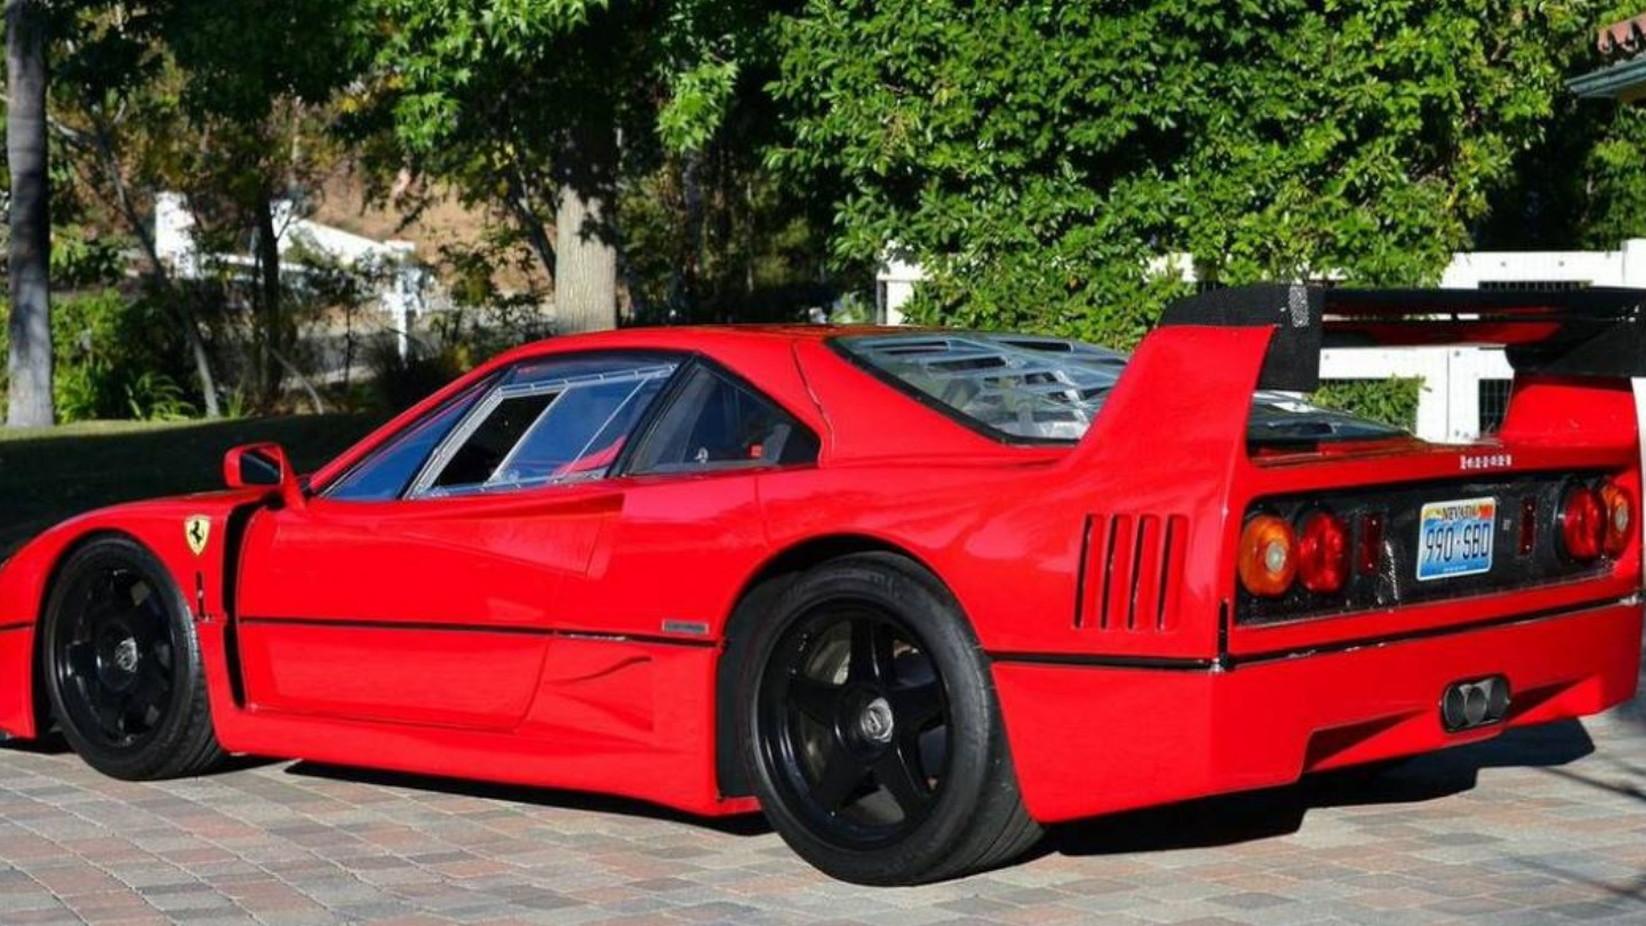 1992 Ferrari F40 converted to LM spec. Images via Hemmings.